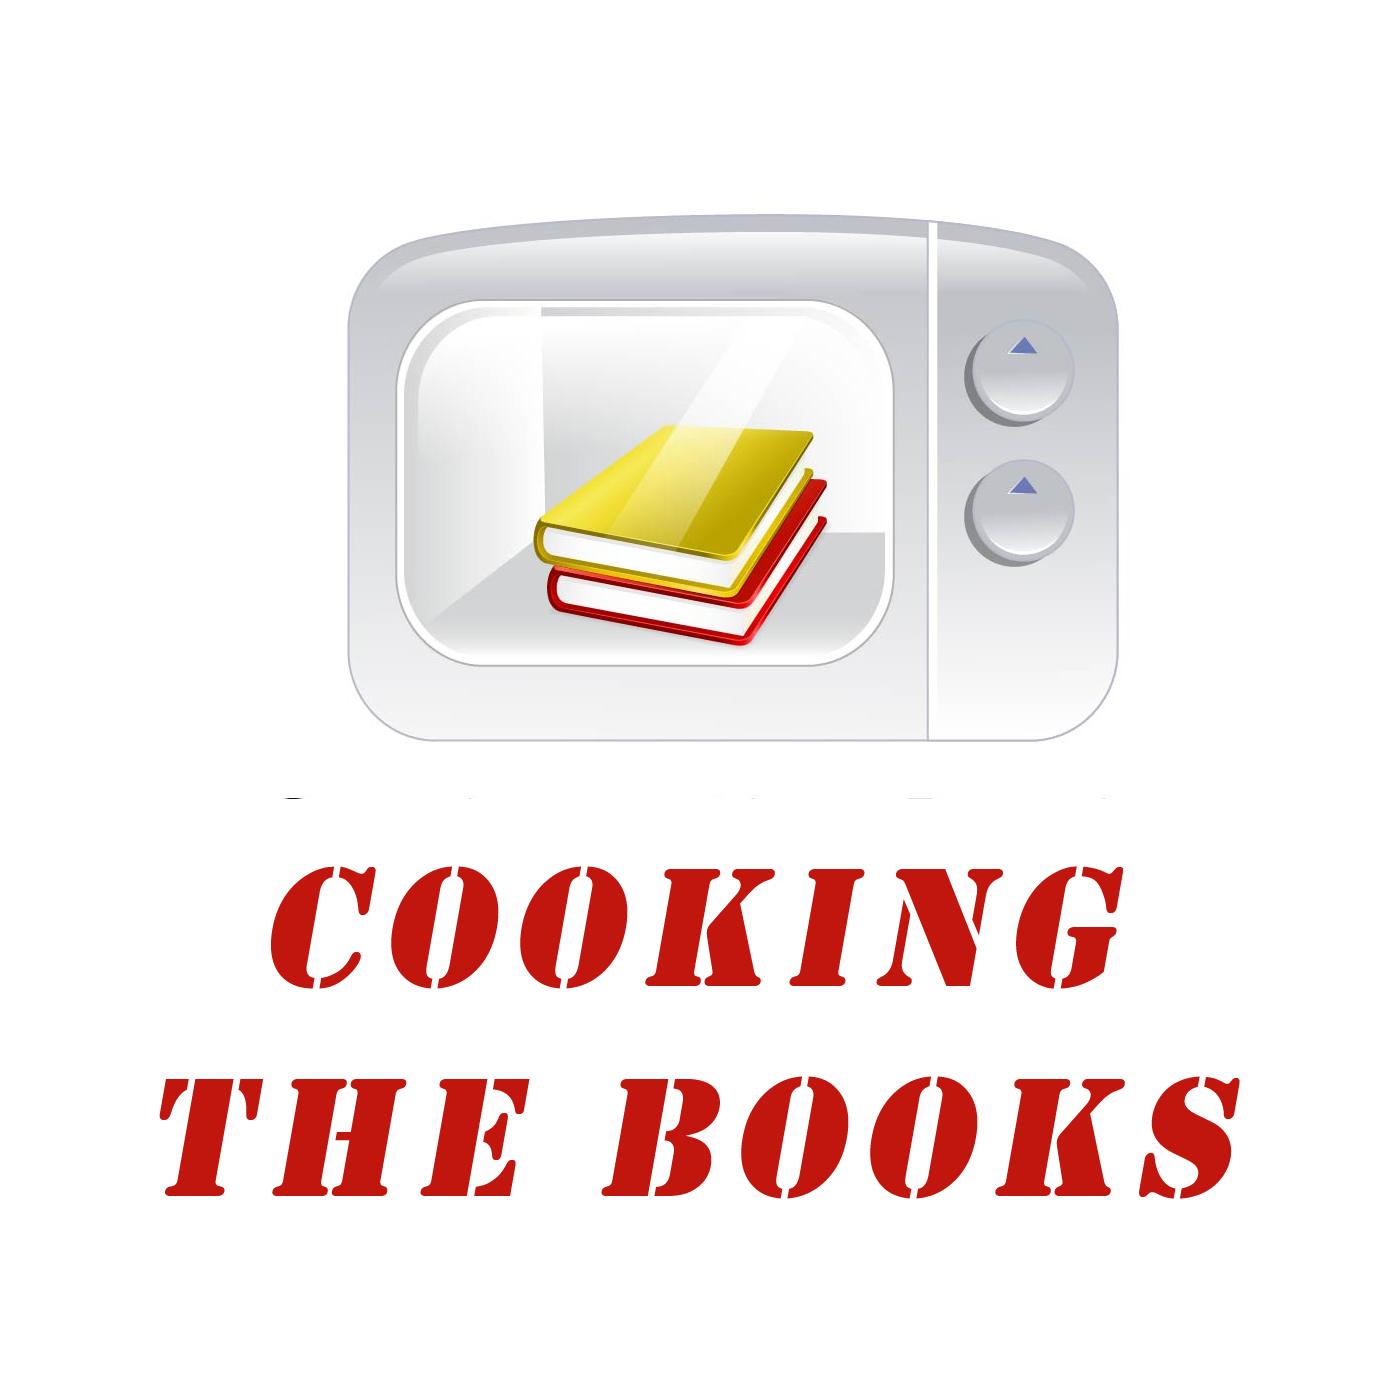 Cooking the Books   Listen via Stitcher Radio On Demand